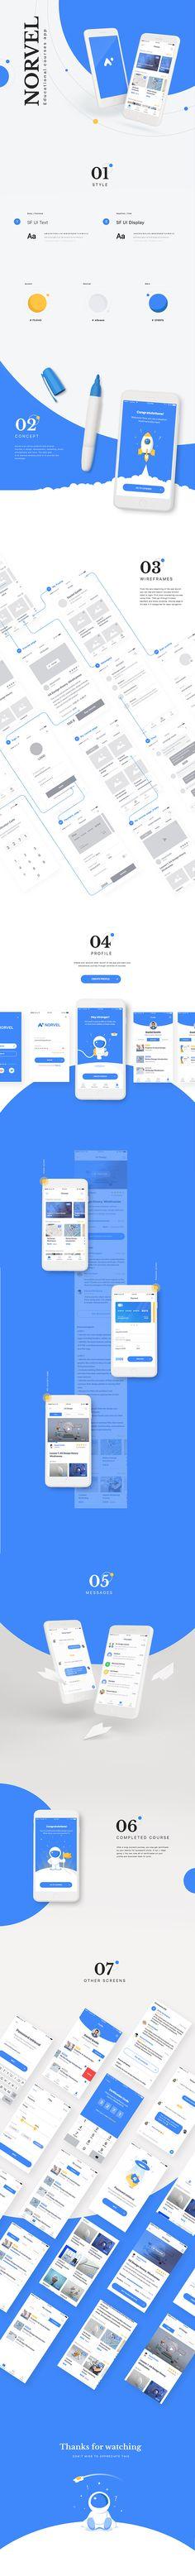 Presentation of mobile app